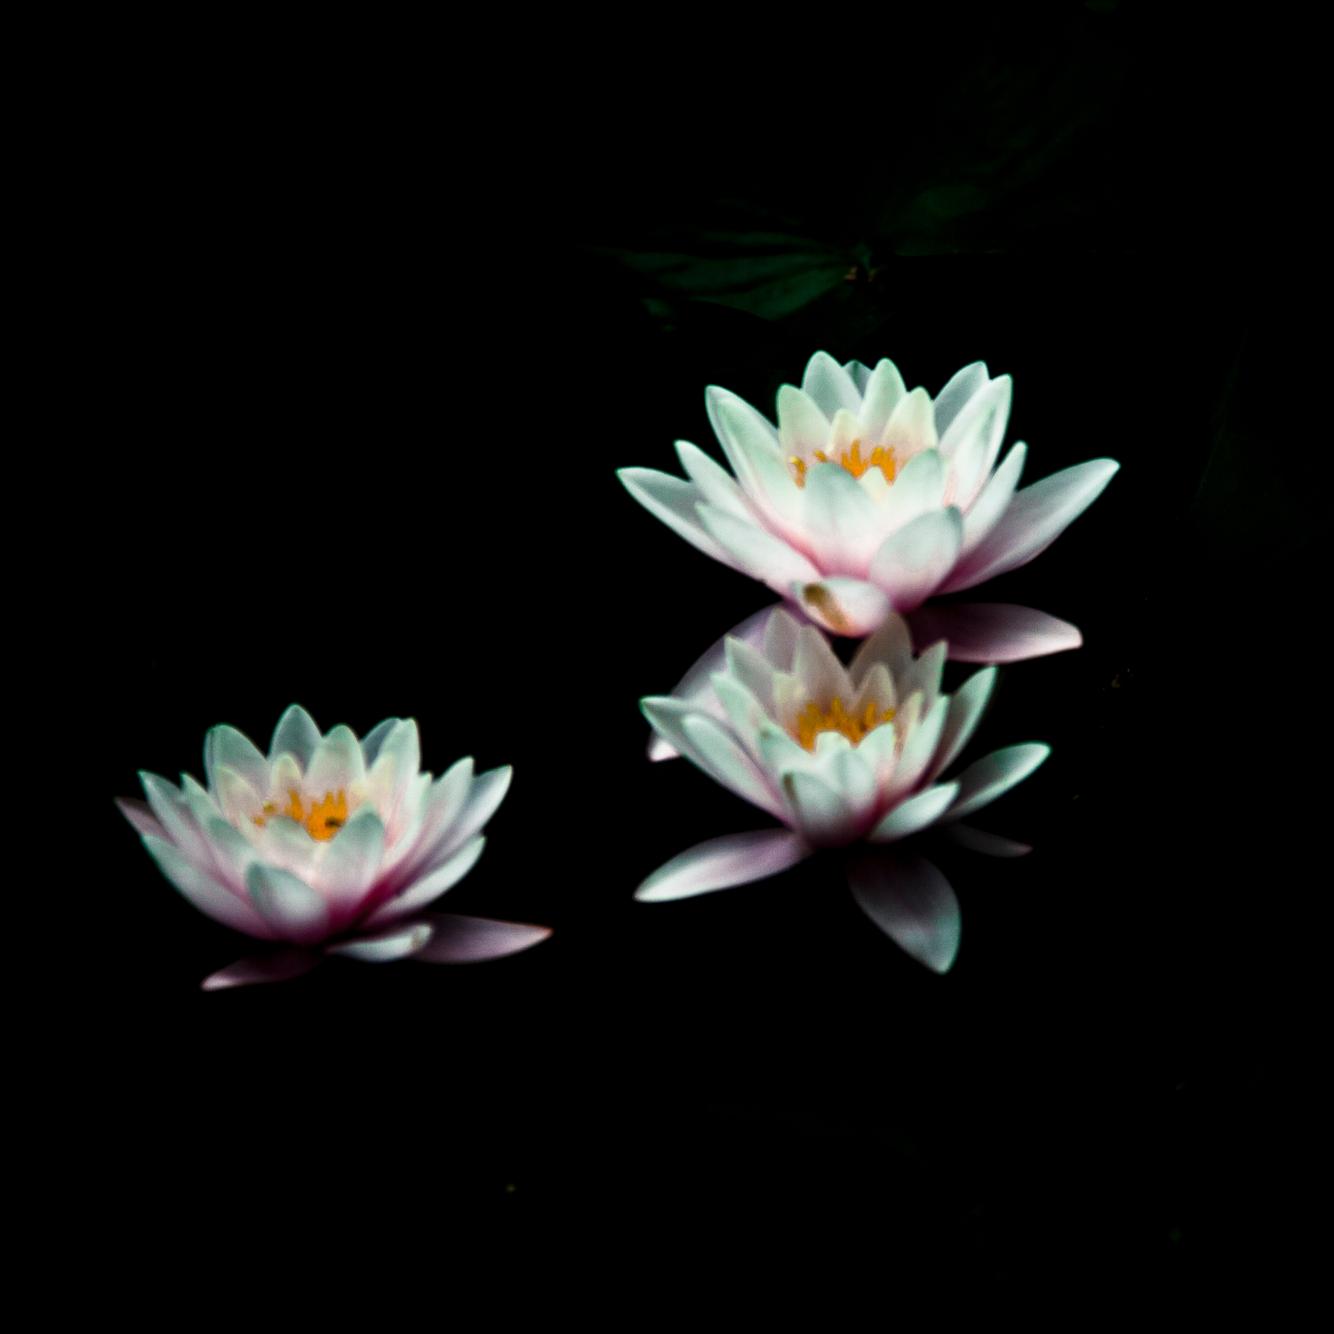 uk_flowers.jpg